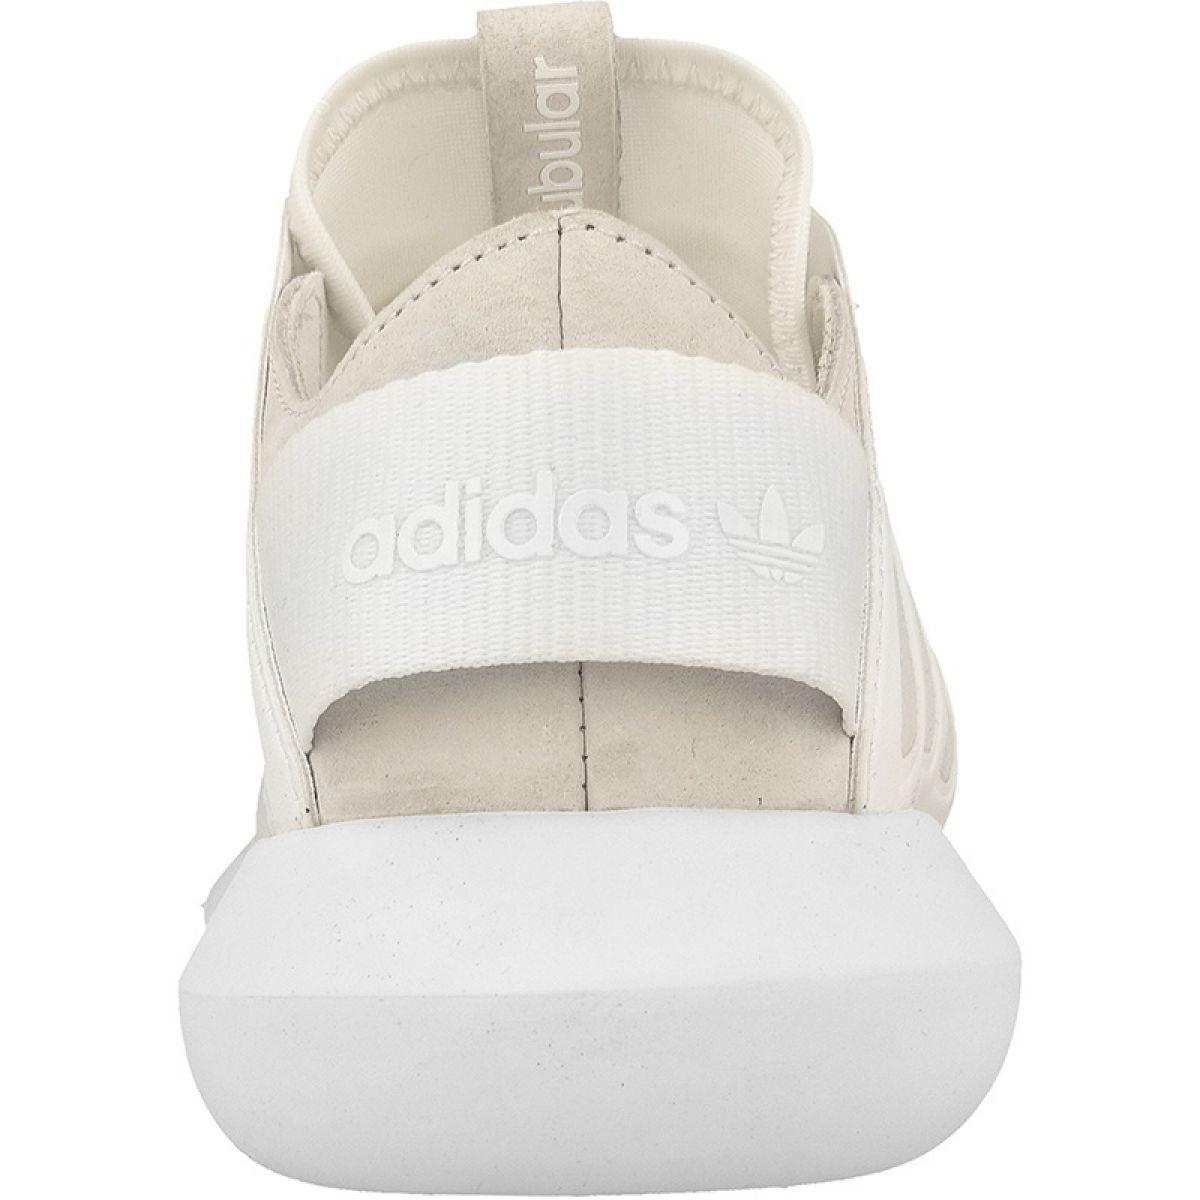 premium selection f92c7 b2c47 White Adidas Originals Tubular Viral shoes in S75583